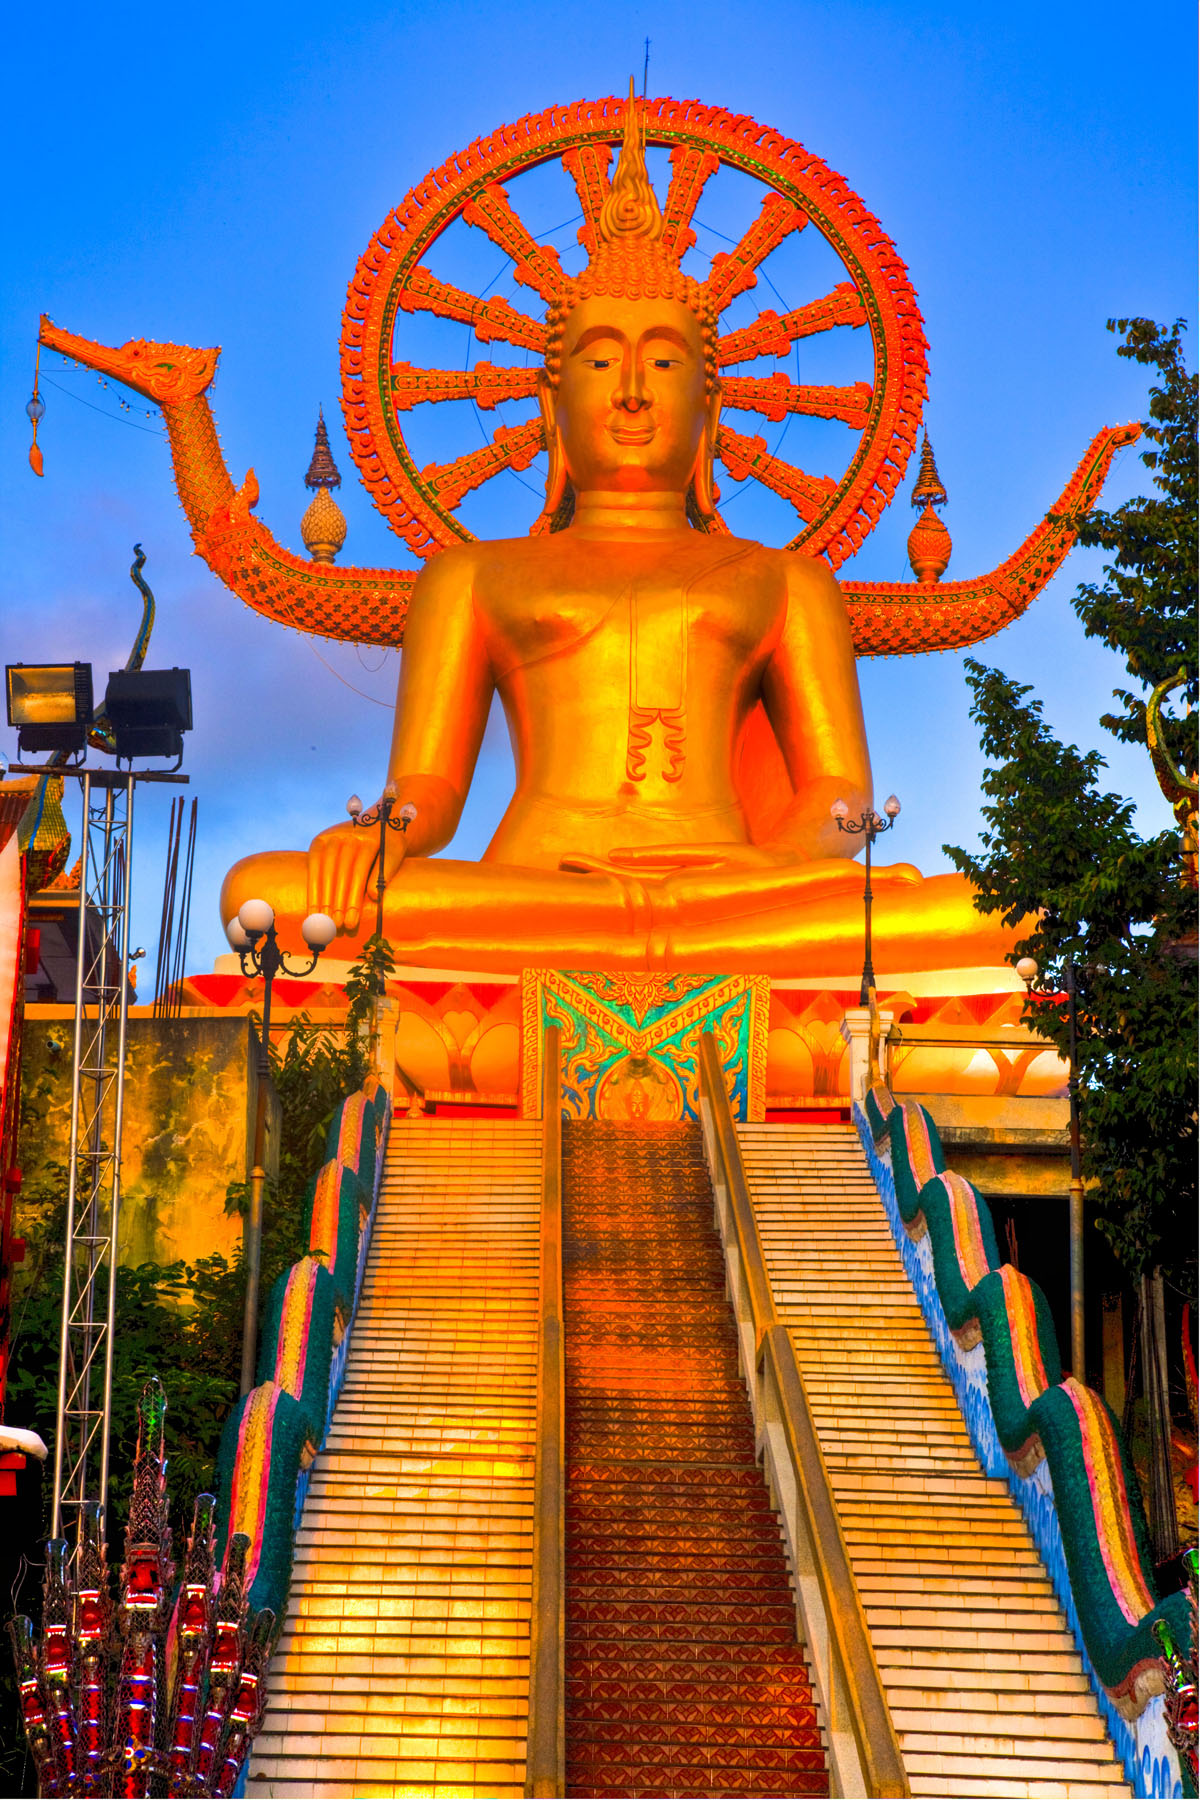 Big Buddha, Ko Samui Island, Thailand photographed by Tom Till